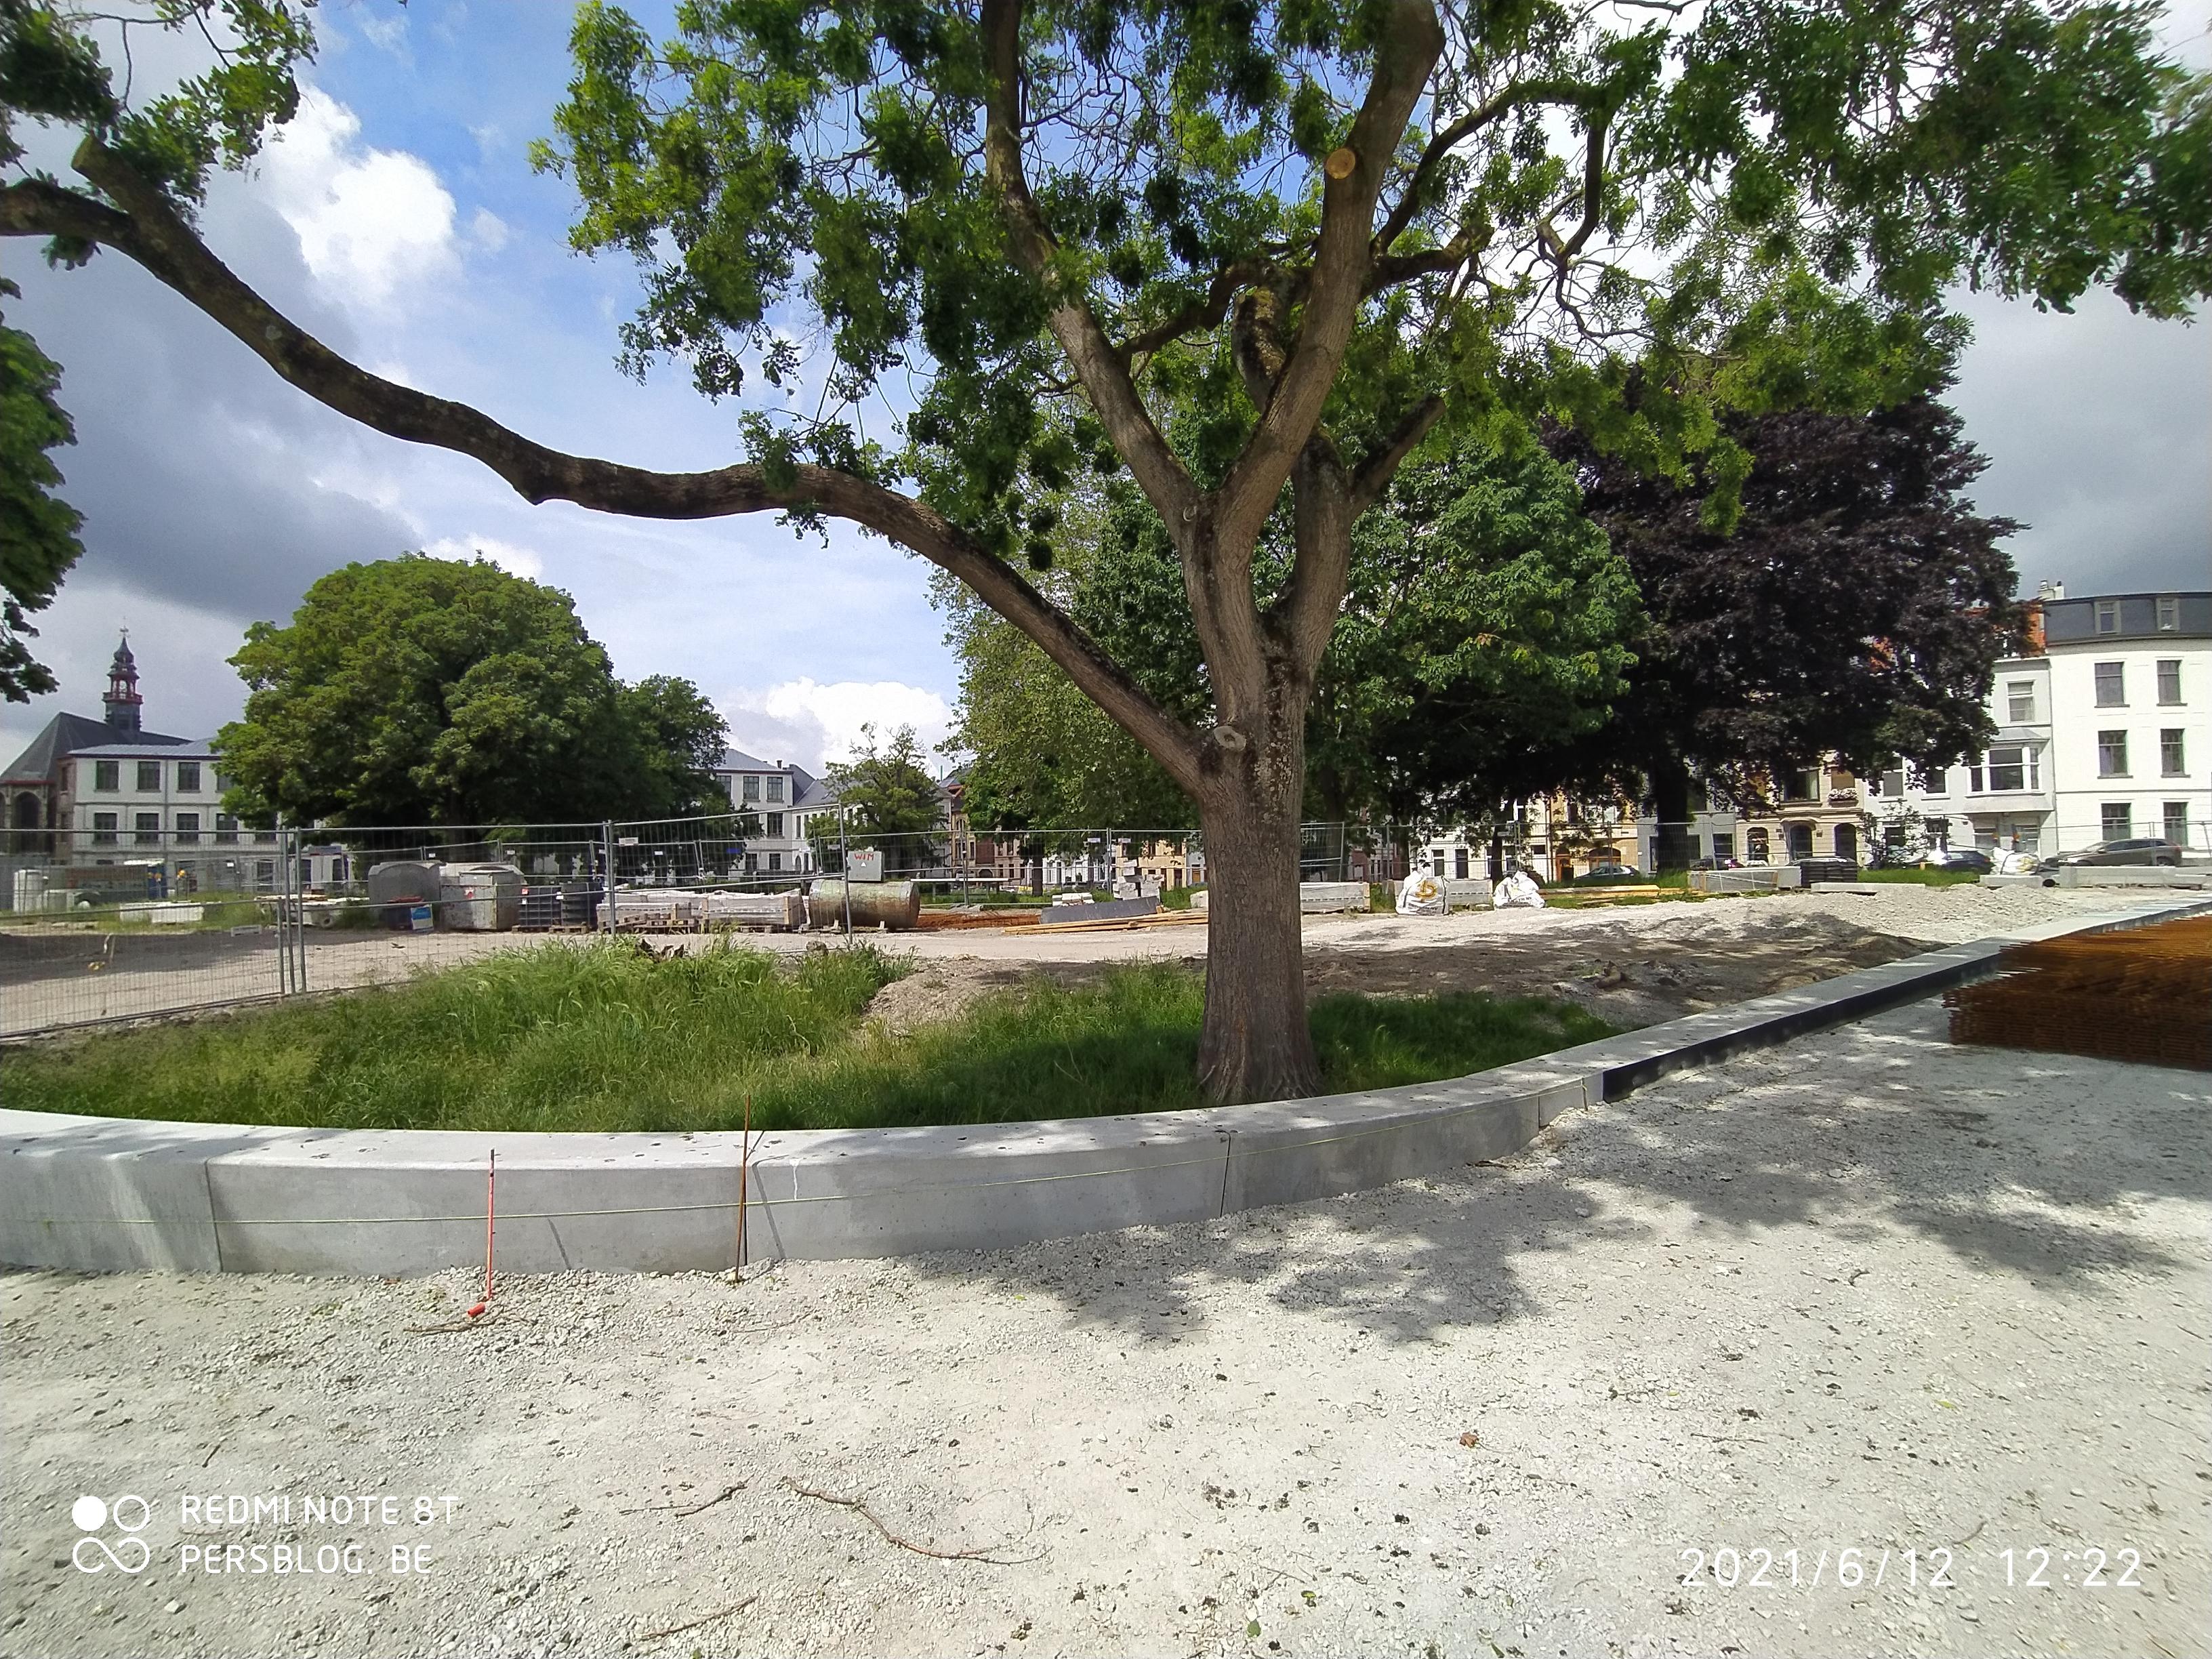 17 Koning Willem I-kaai - Baudelostraat IMG_20210612_122202 (2)